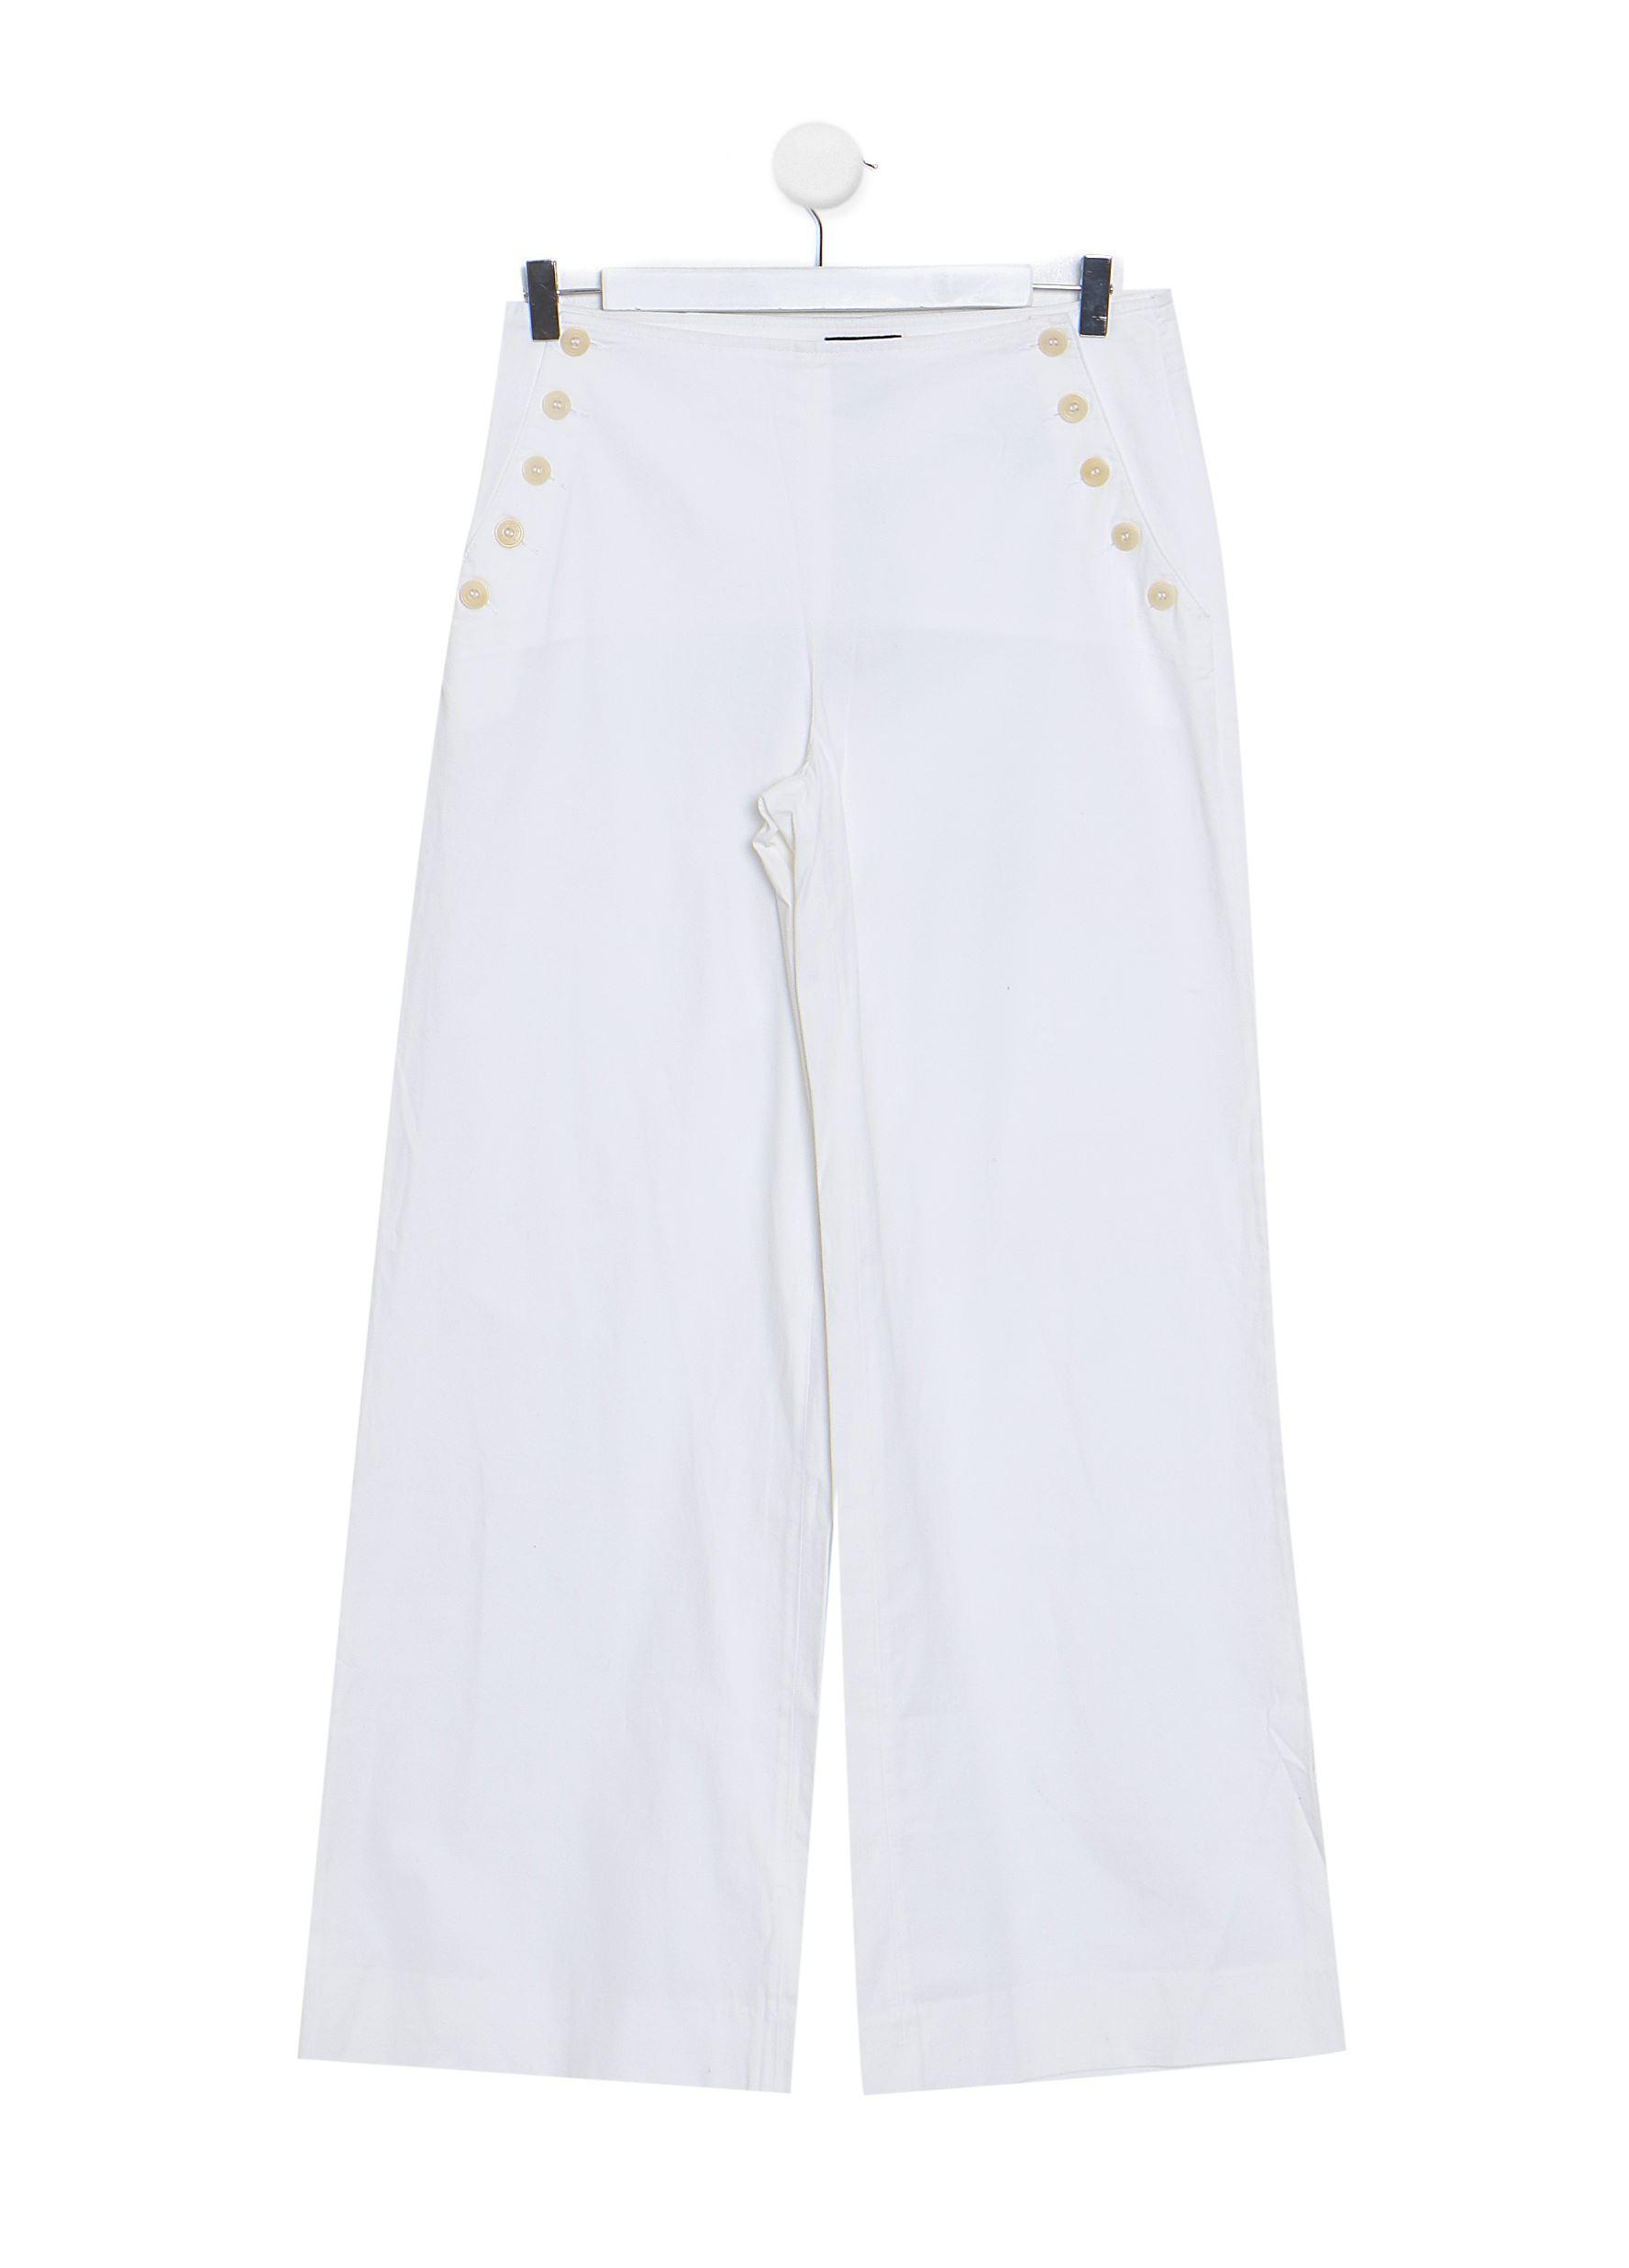 Gant - Γυναικείο Παντελόνι GANT